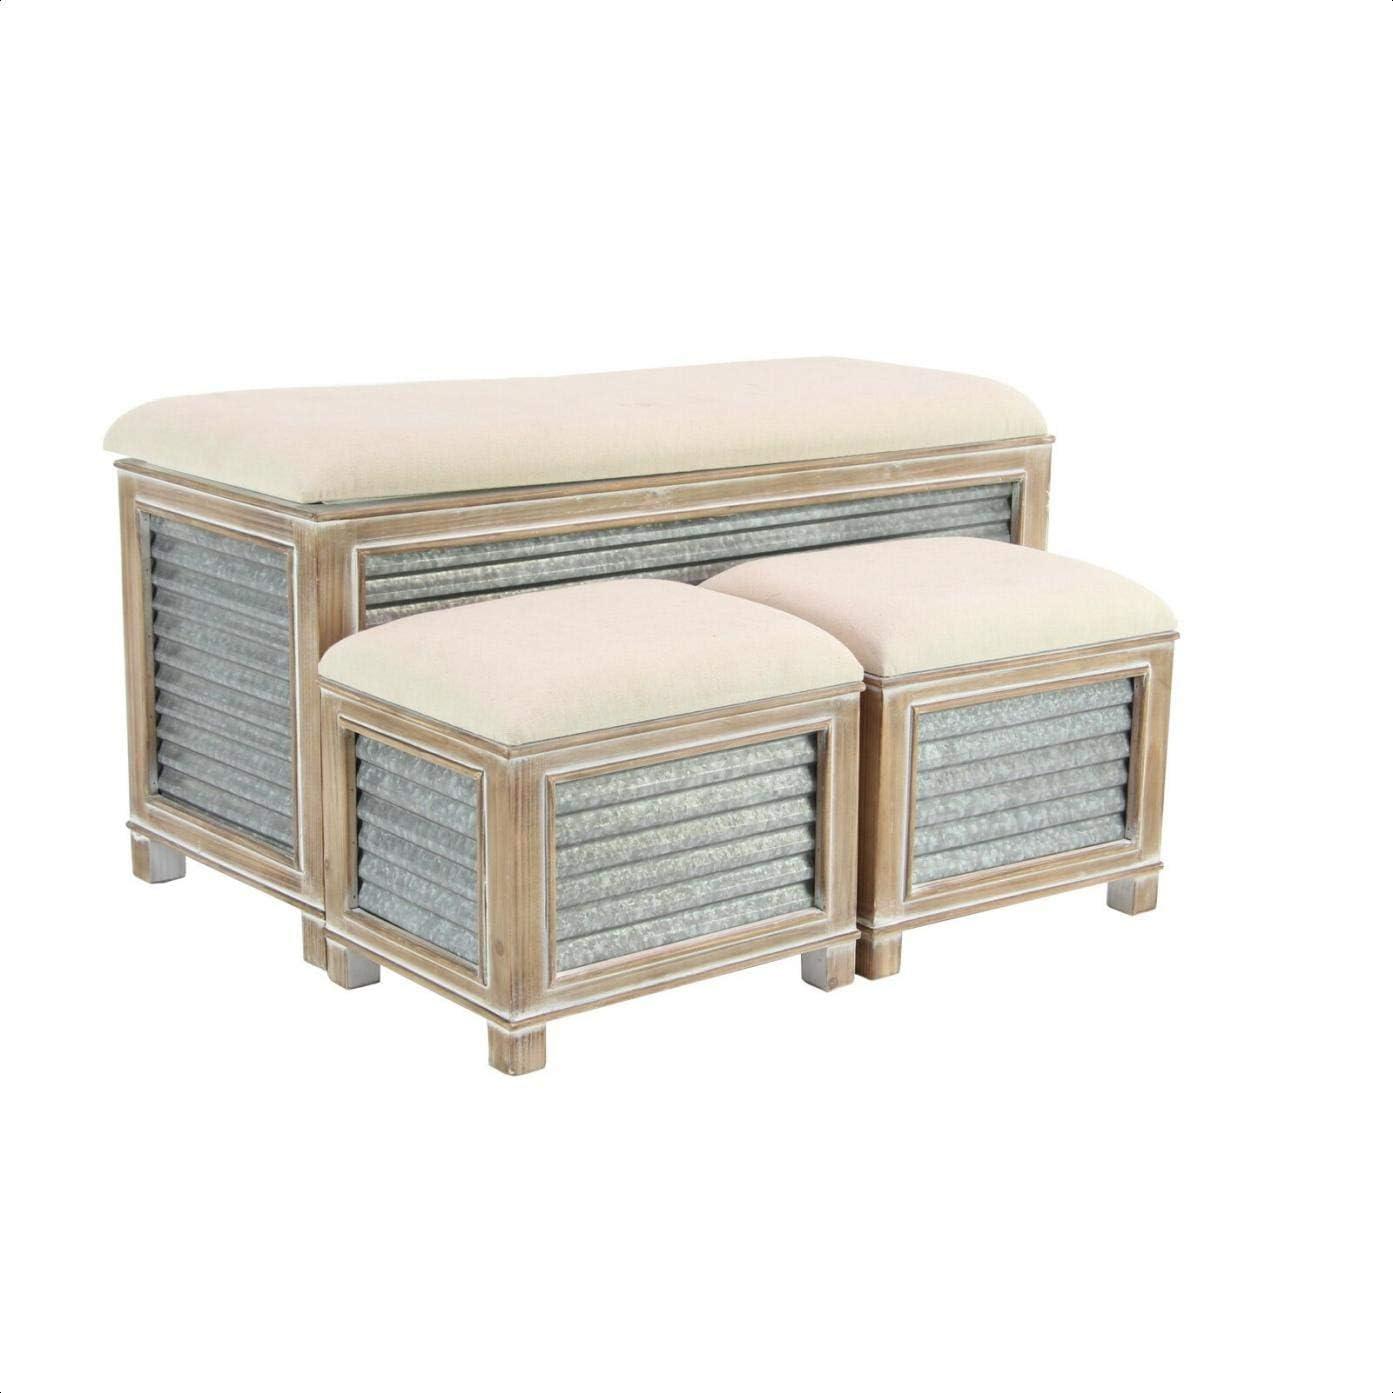 Amazon Com Wiggins Farmhouse Upholstered Storage Bench Kitchen Dining